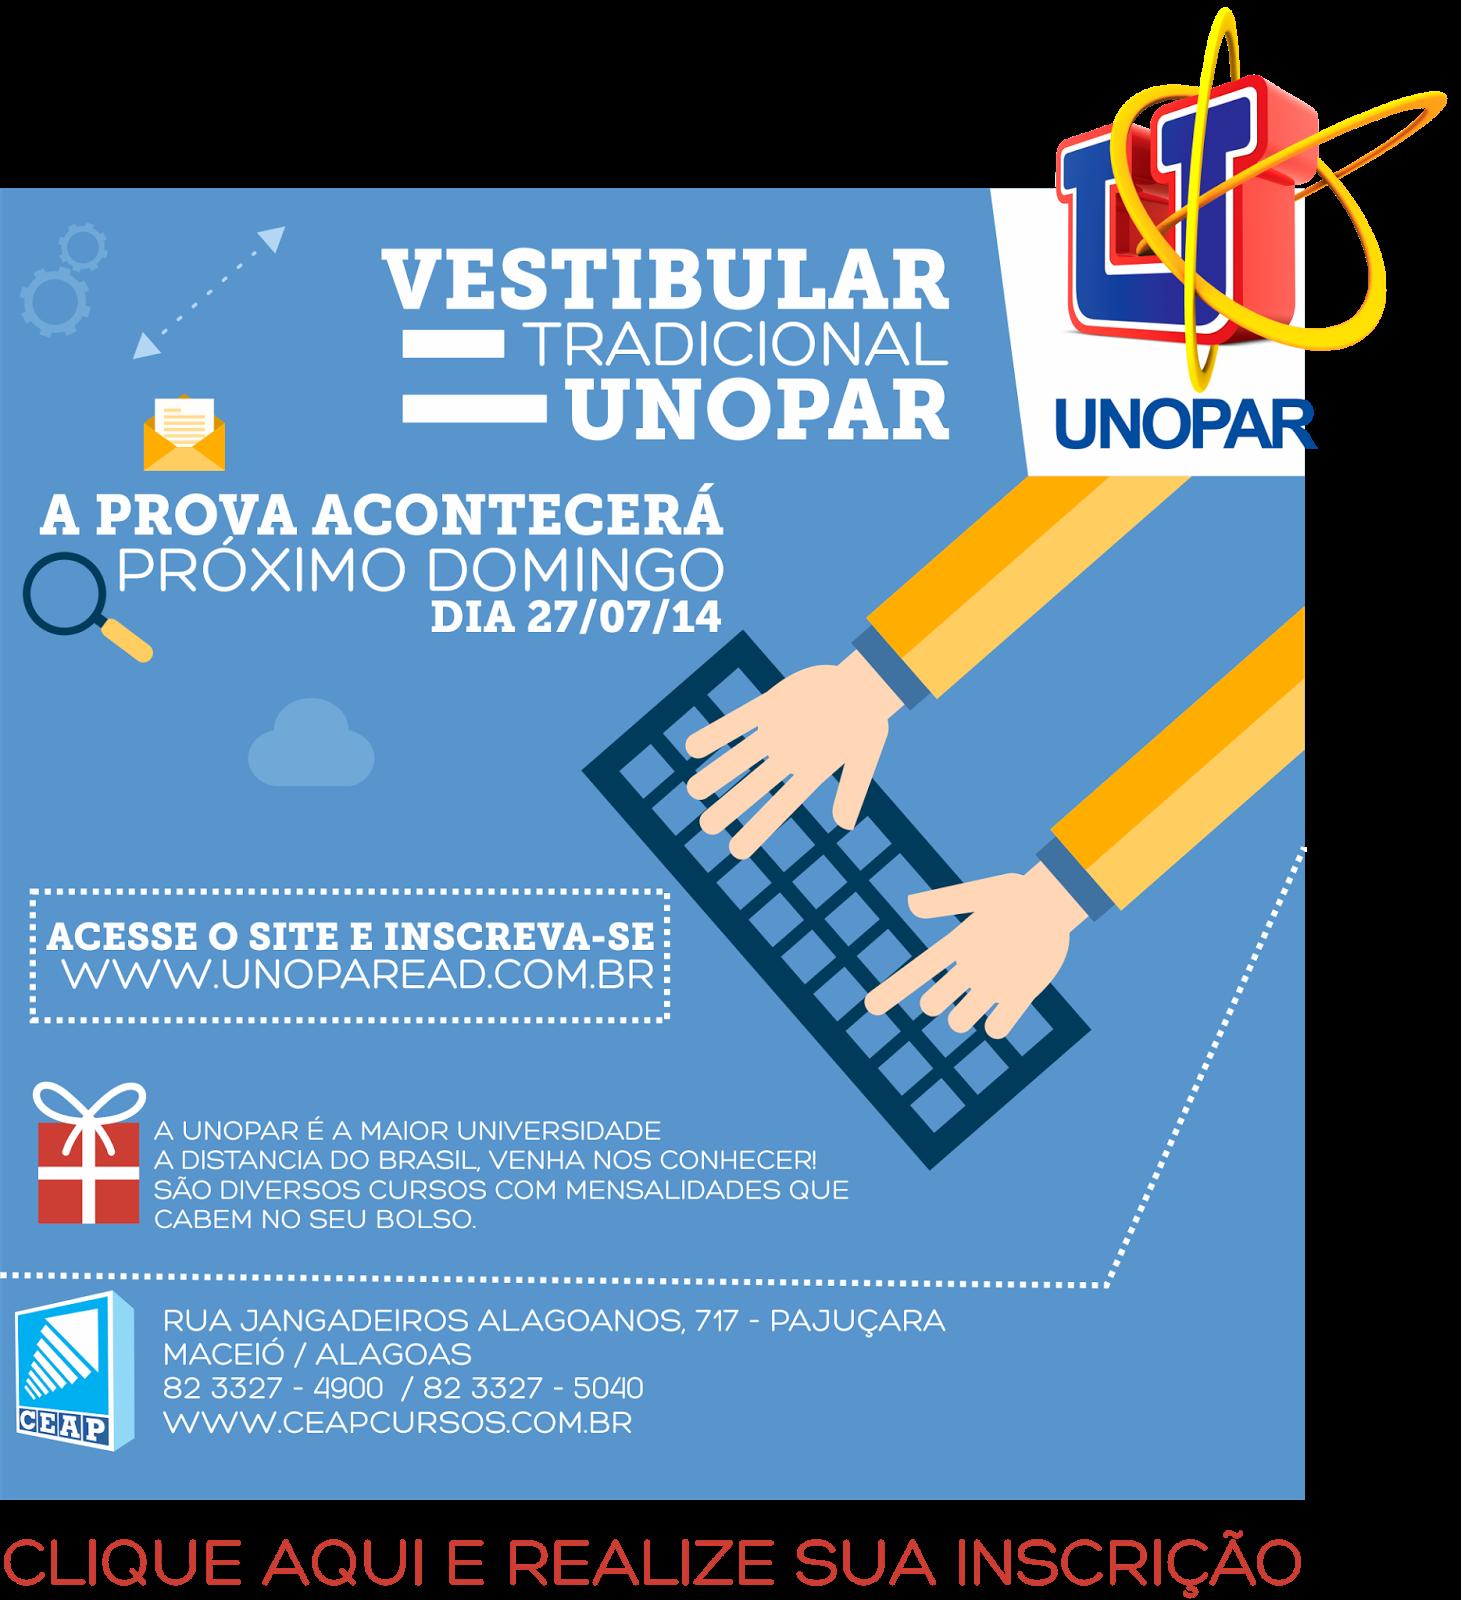 www.unoparead.com.br